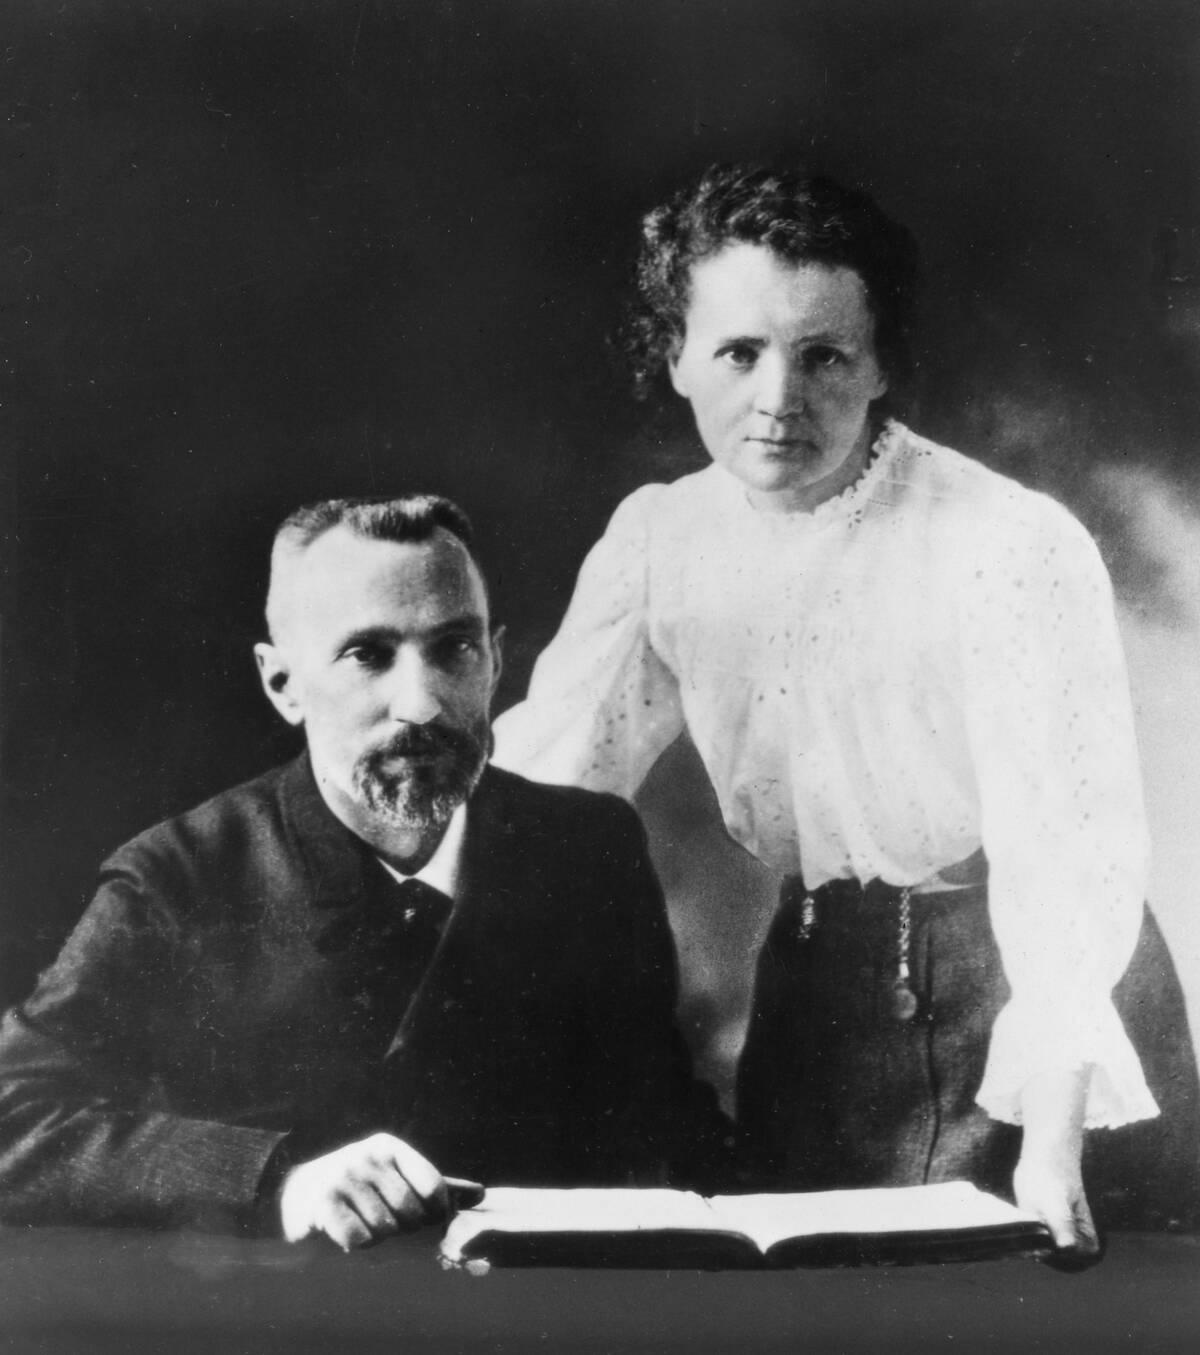 Pierre Curie Marie Sklodowska Curie